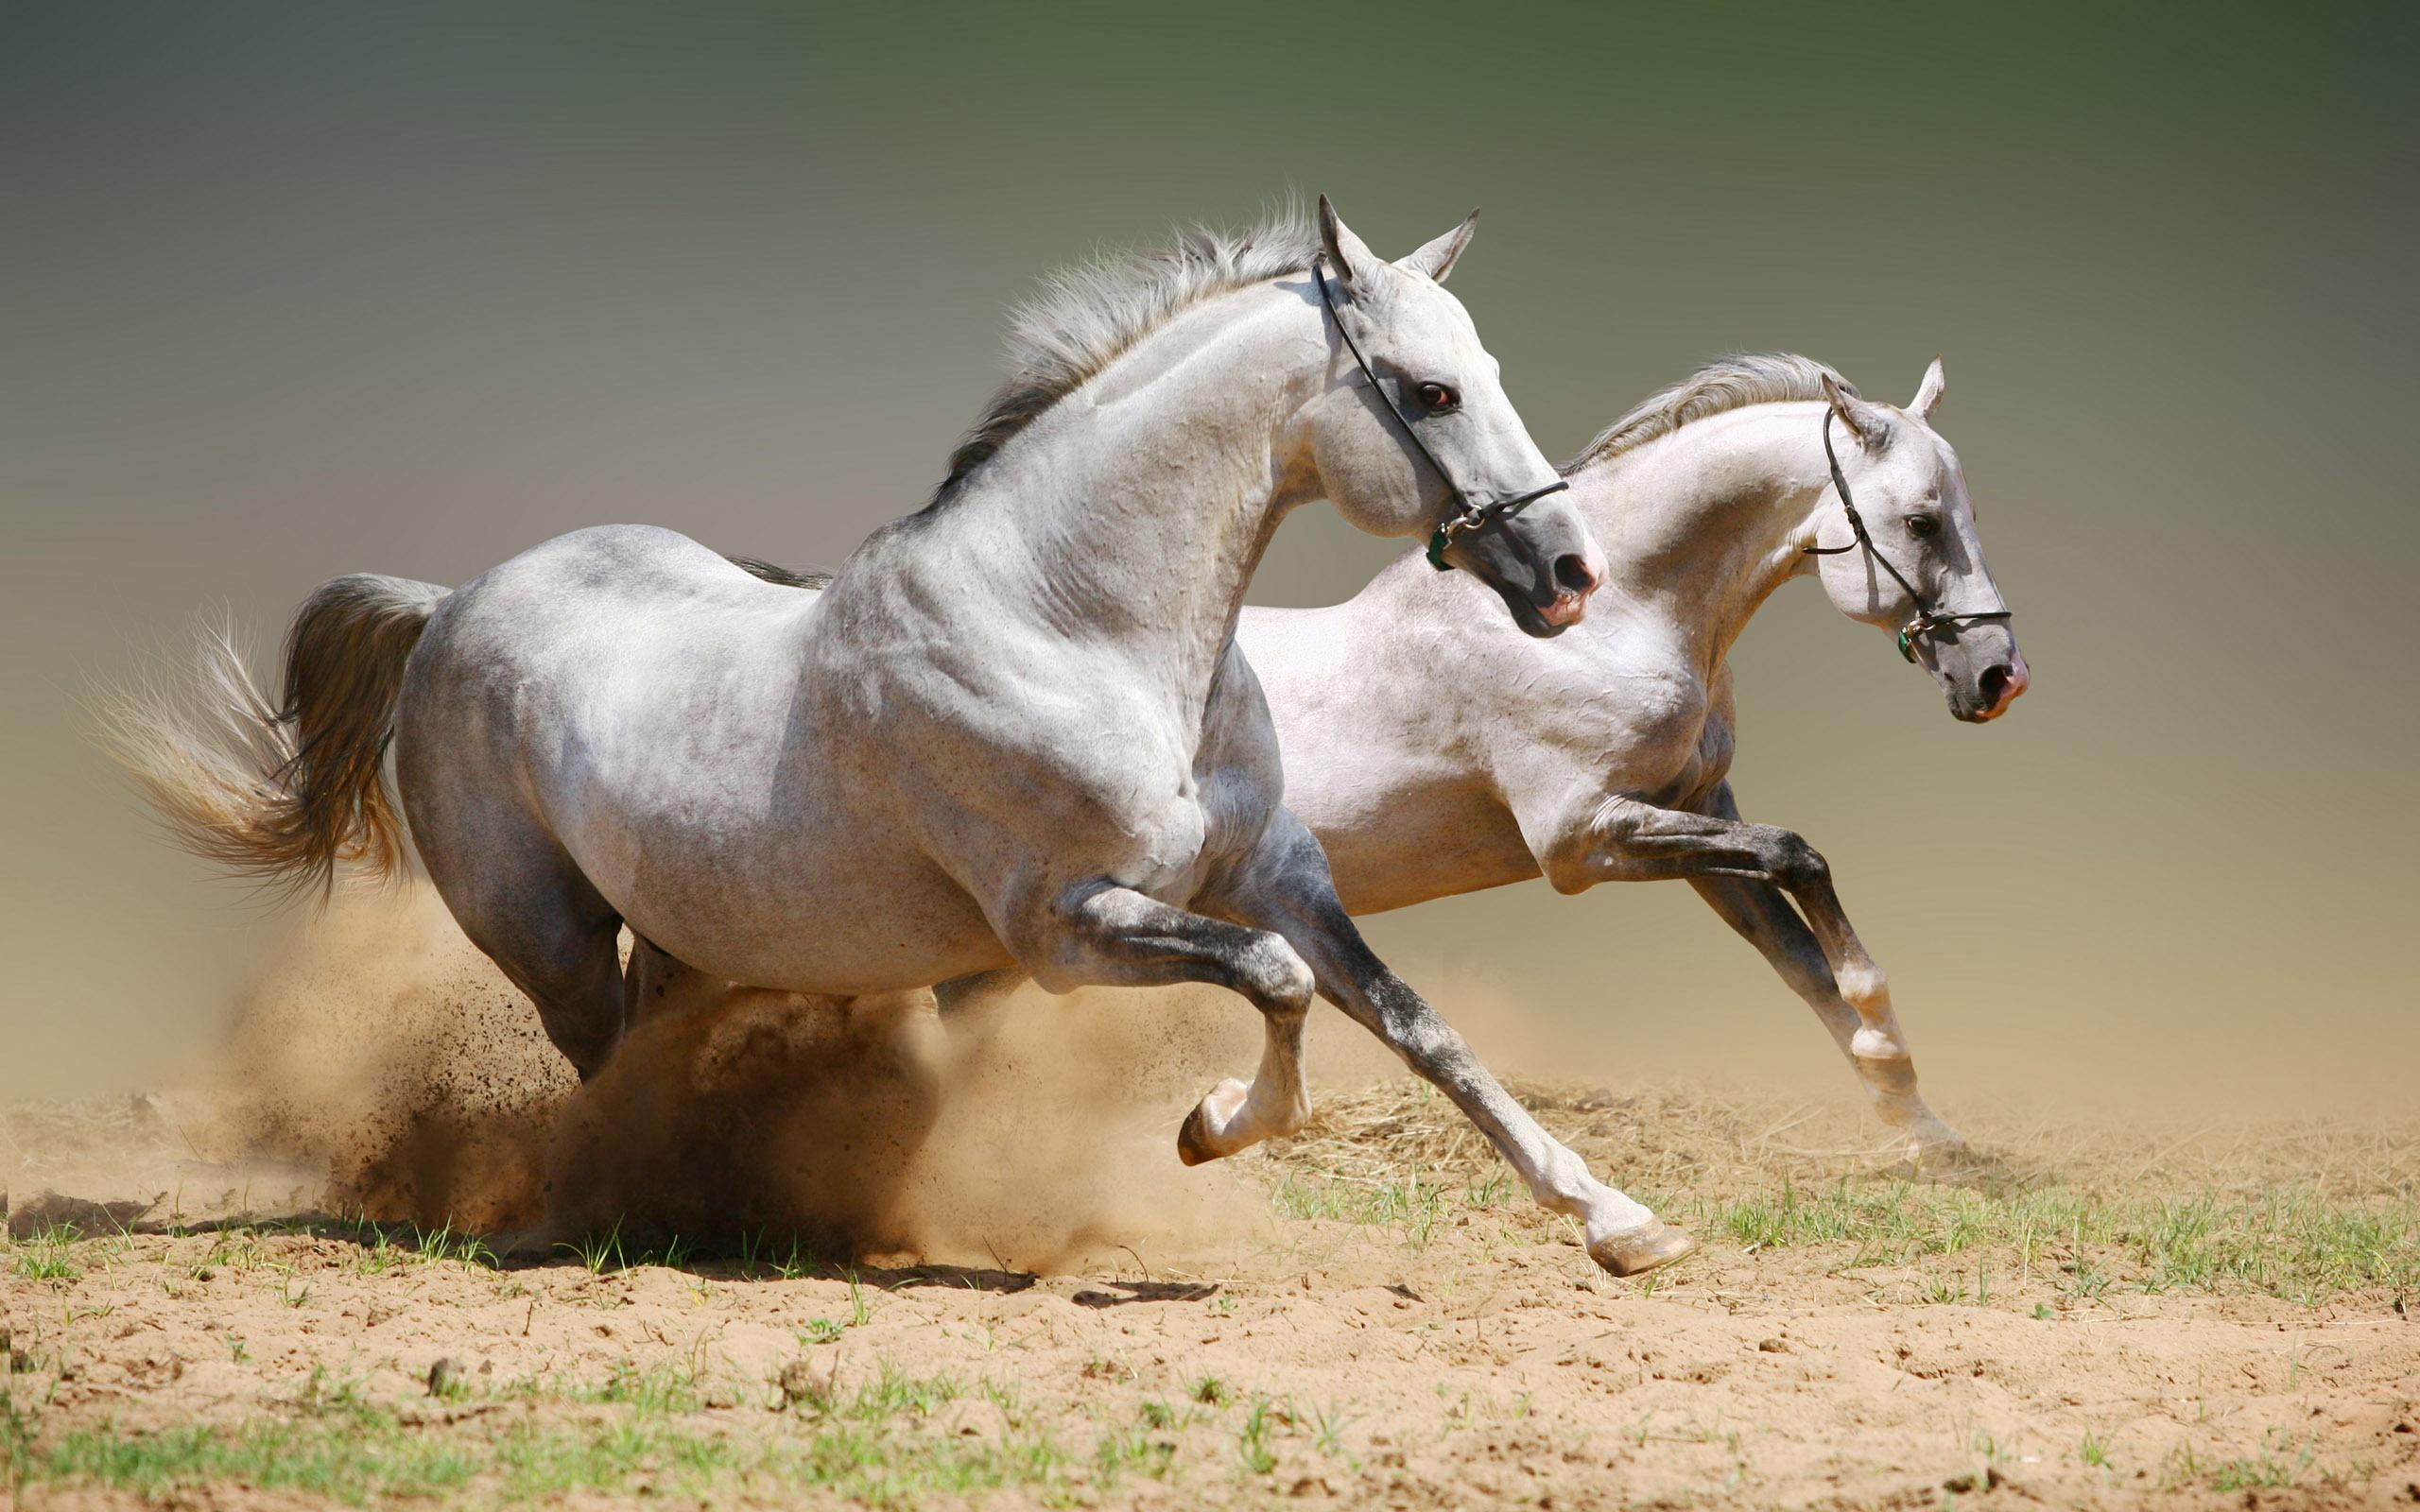 Horse desktop wallpaper is a great wallpaper for your computer desktop 2560x1600